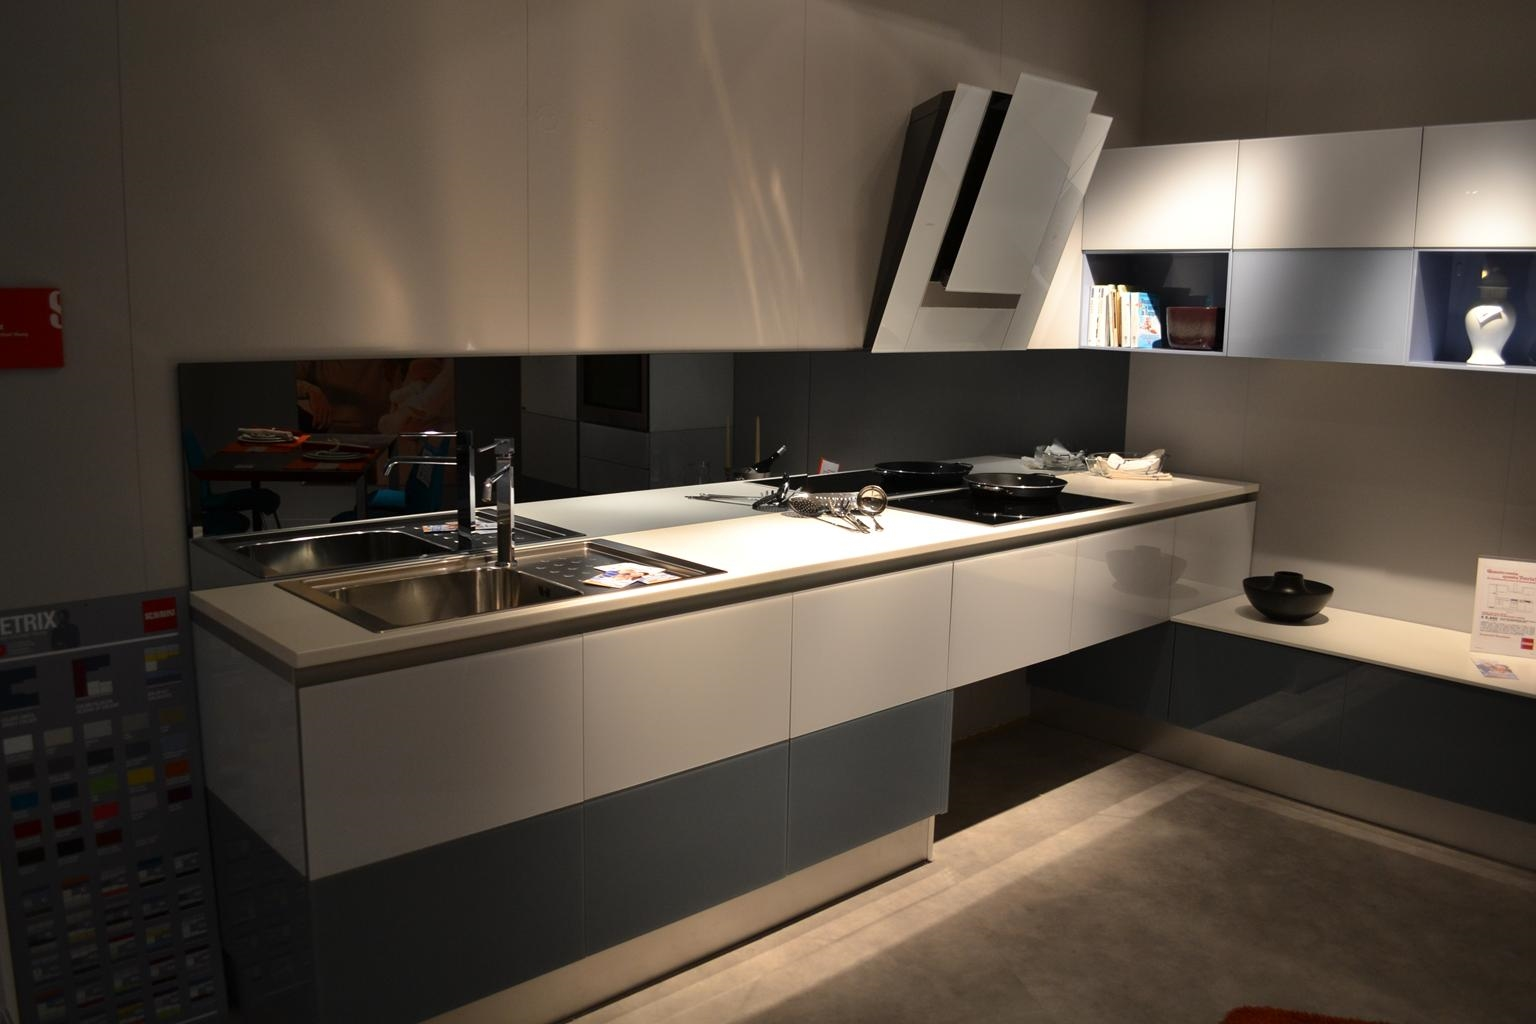 Cucina scavolini tetrix vetro multicolor lucida design - Top cucina in vetro ...